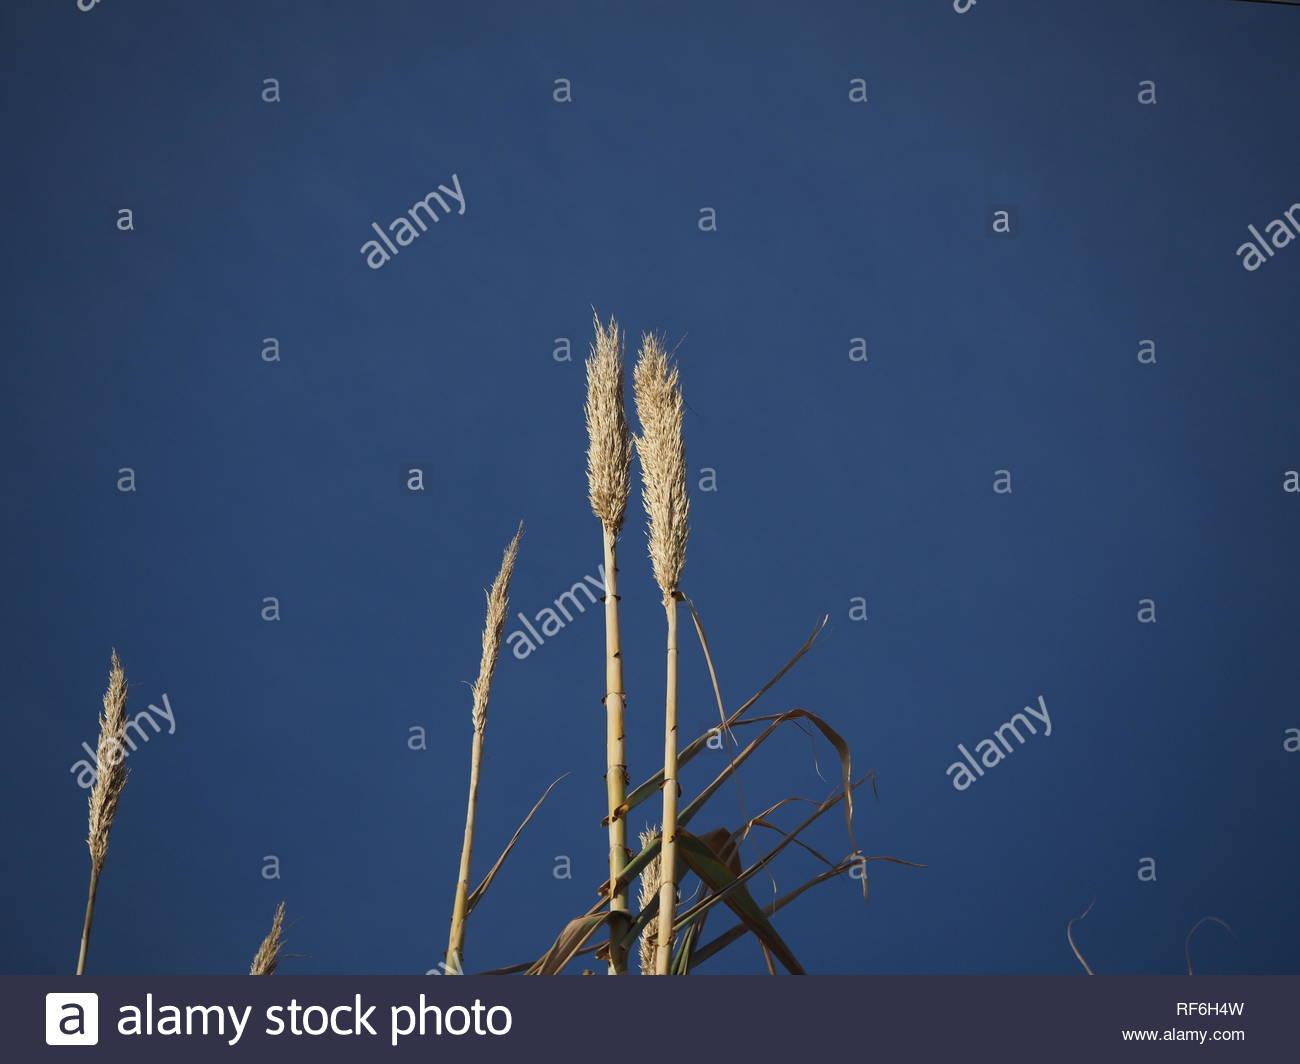 Common Reeds Upper part - Phragmites australis - Stock Image